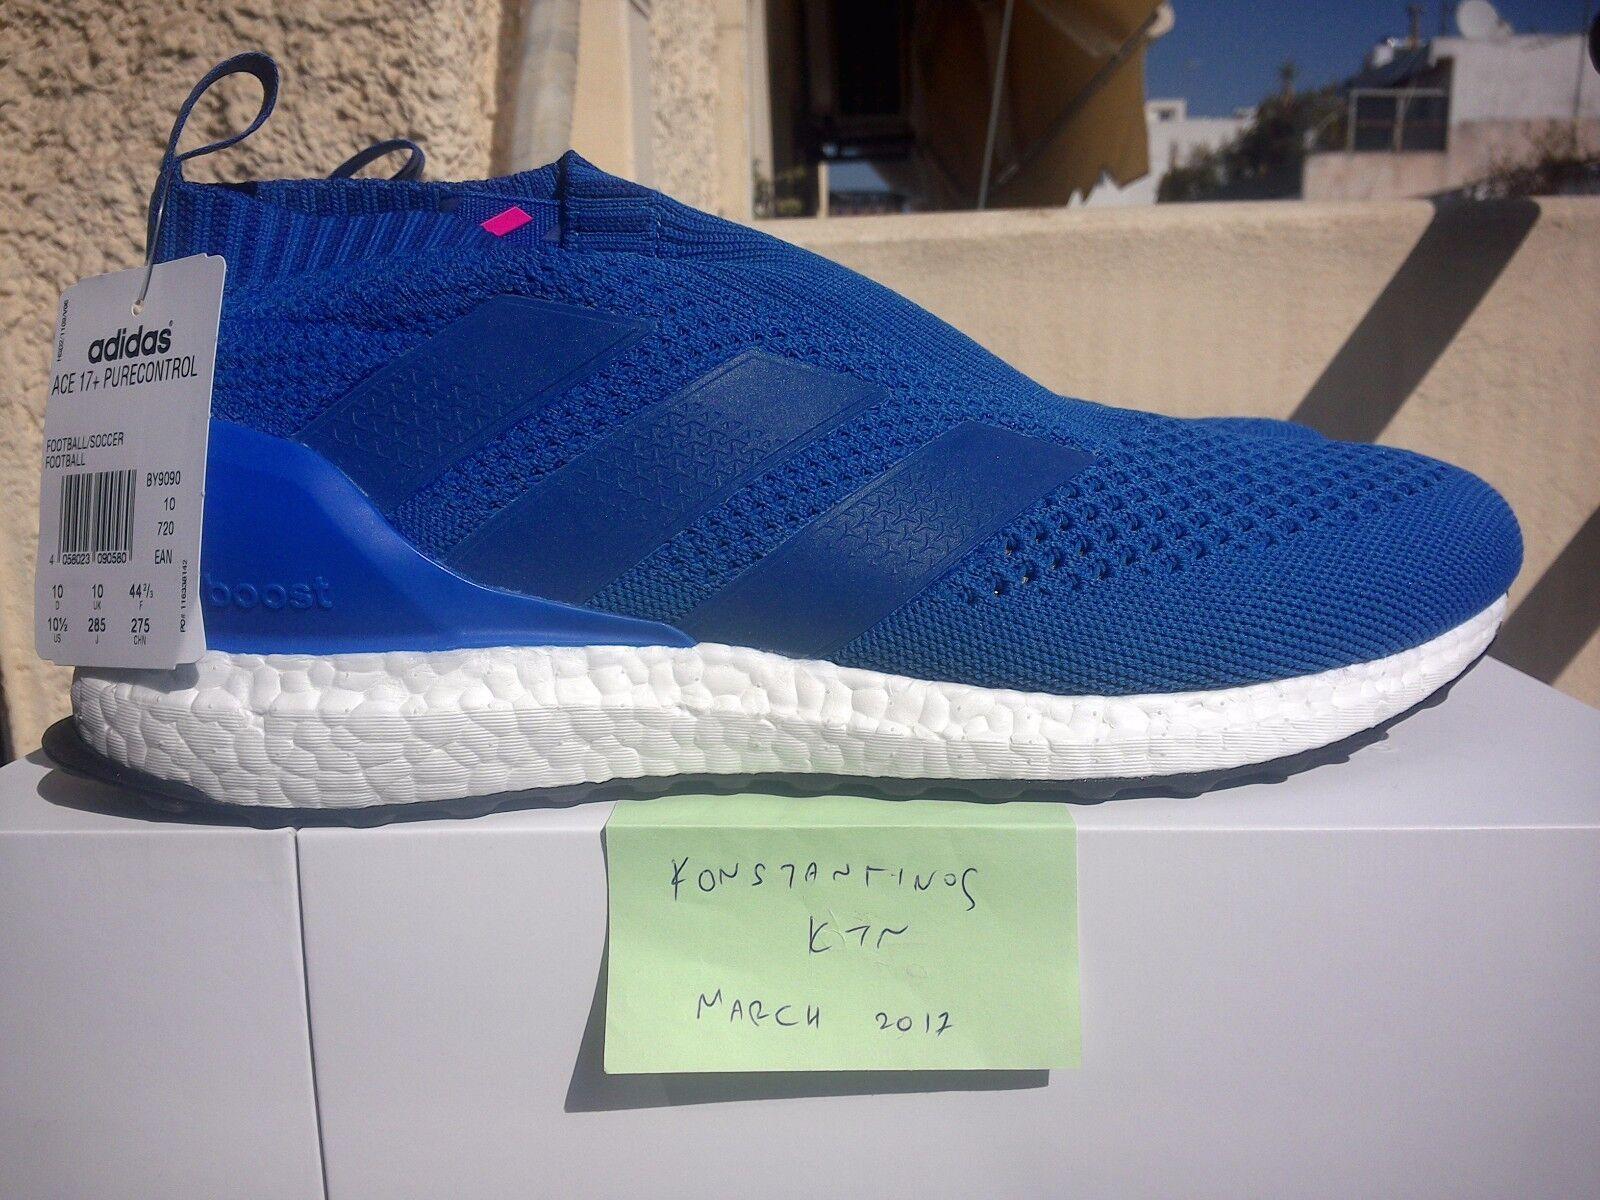 Adidas Ace By9090 17 Purecontrol Ultra Blau By9090 Ace Ltd Uns